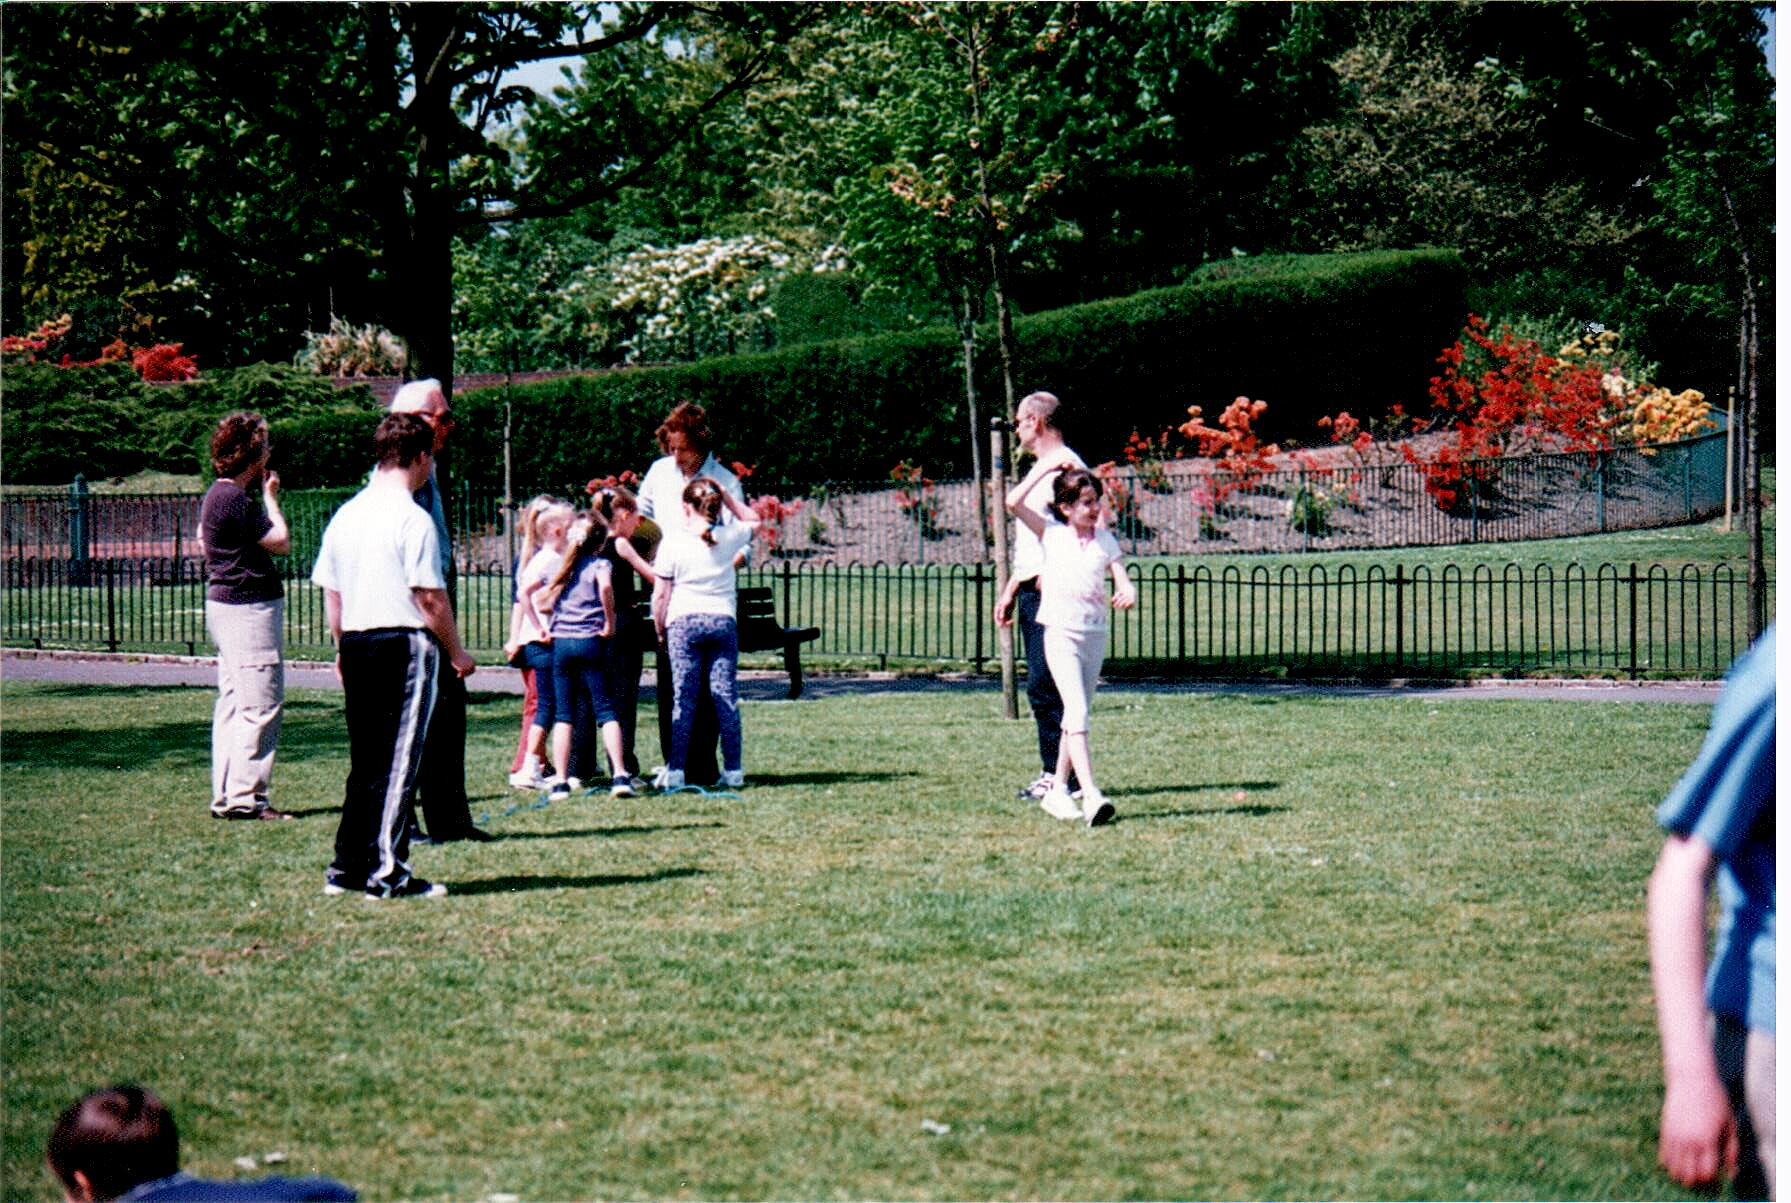 KGH 2001 SS Victoria Park 13.jpg